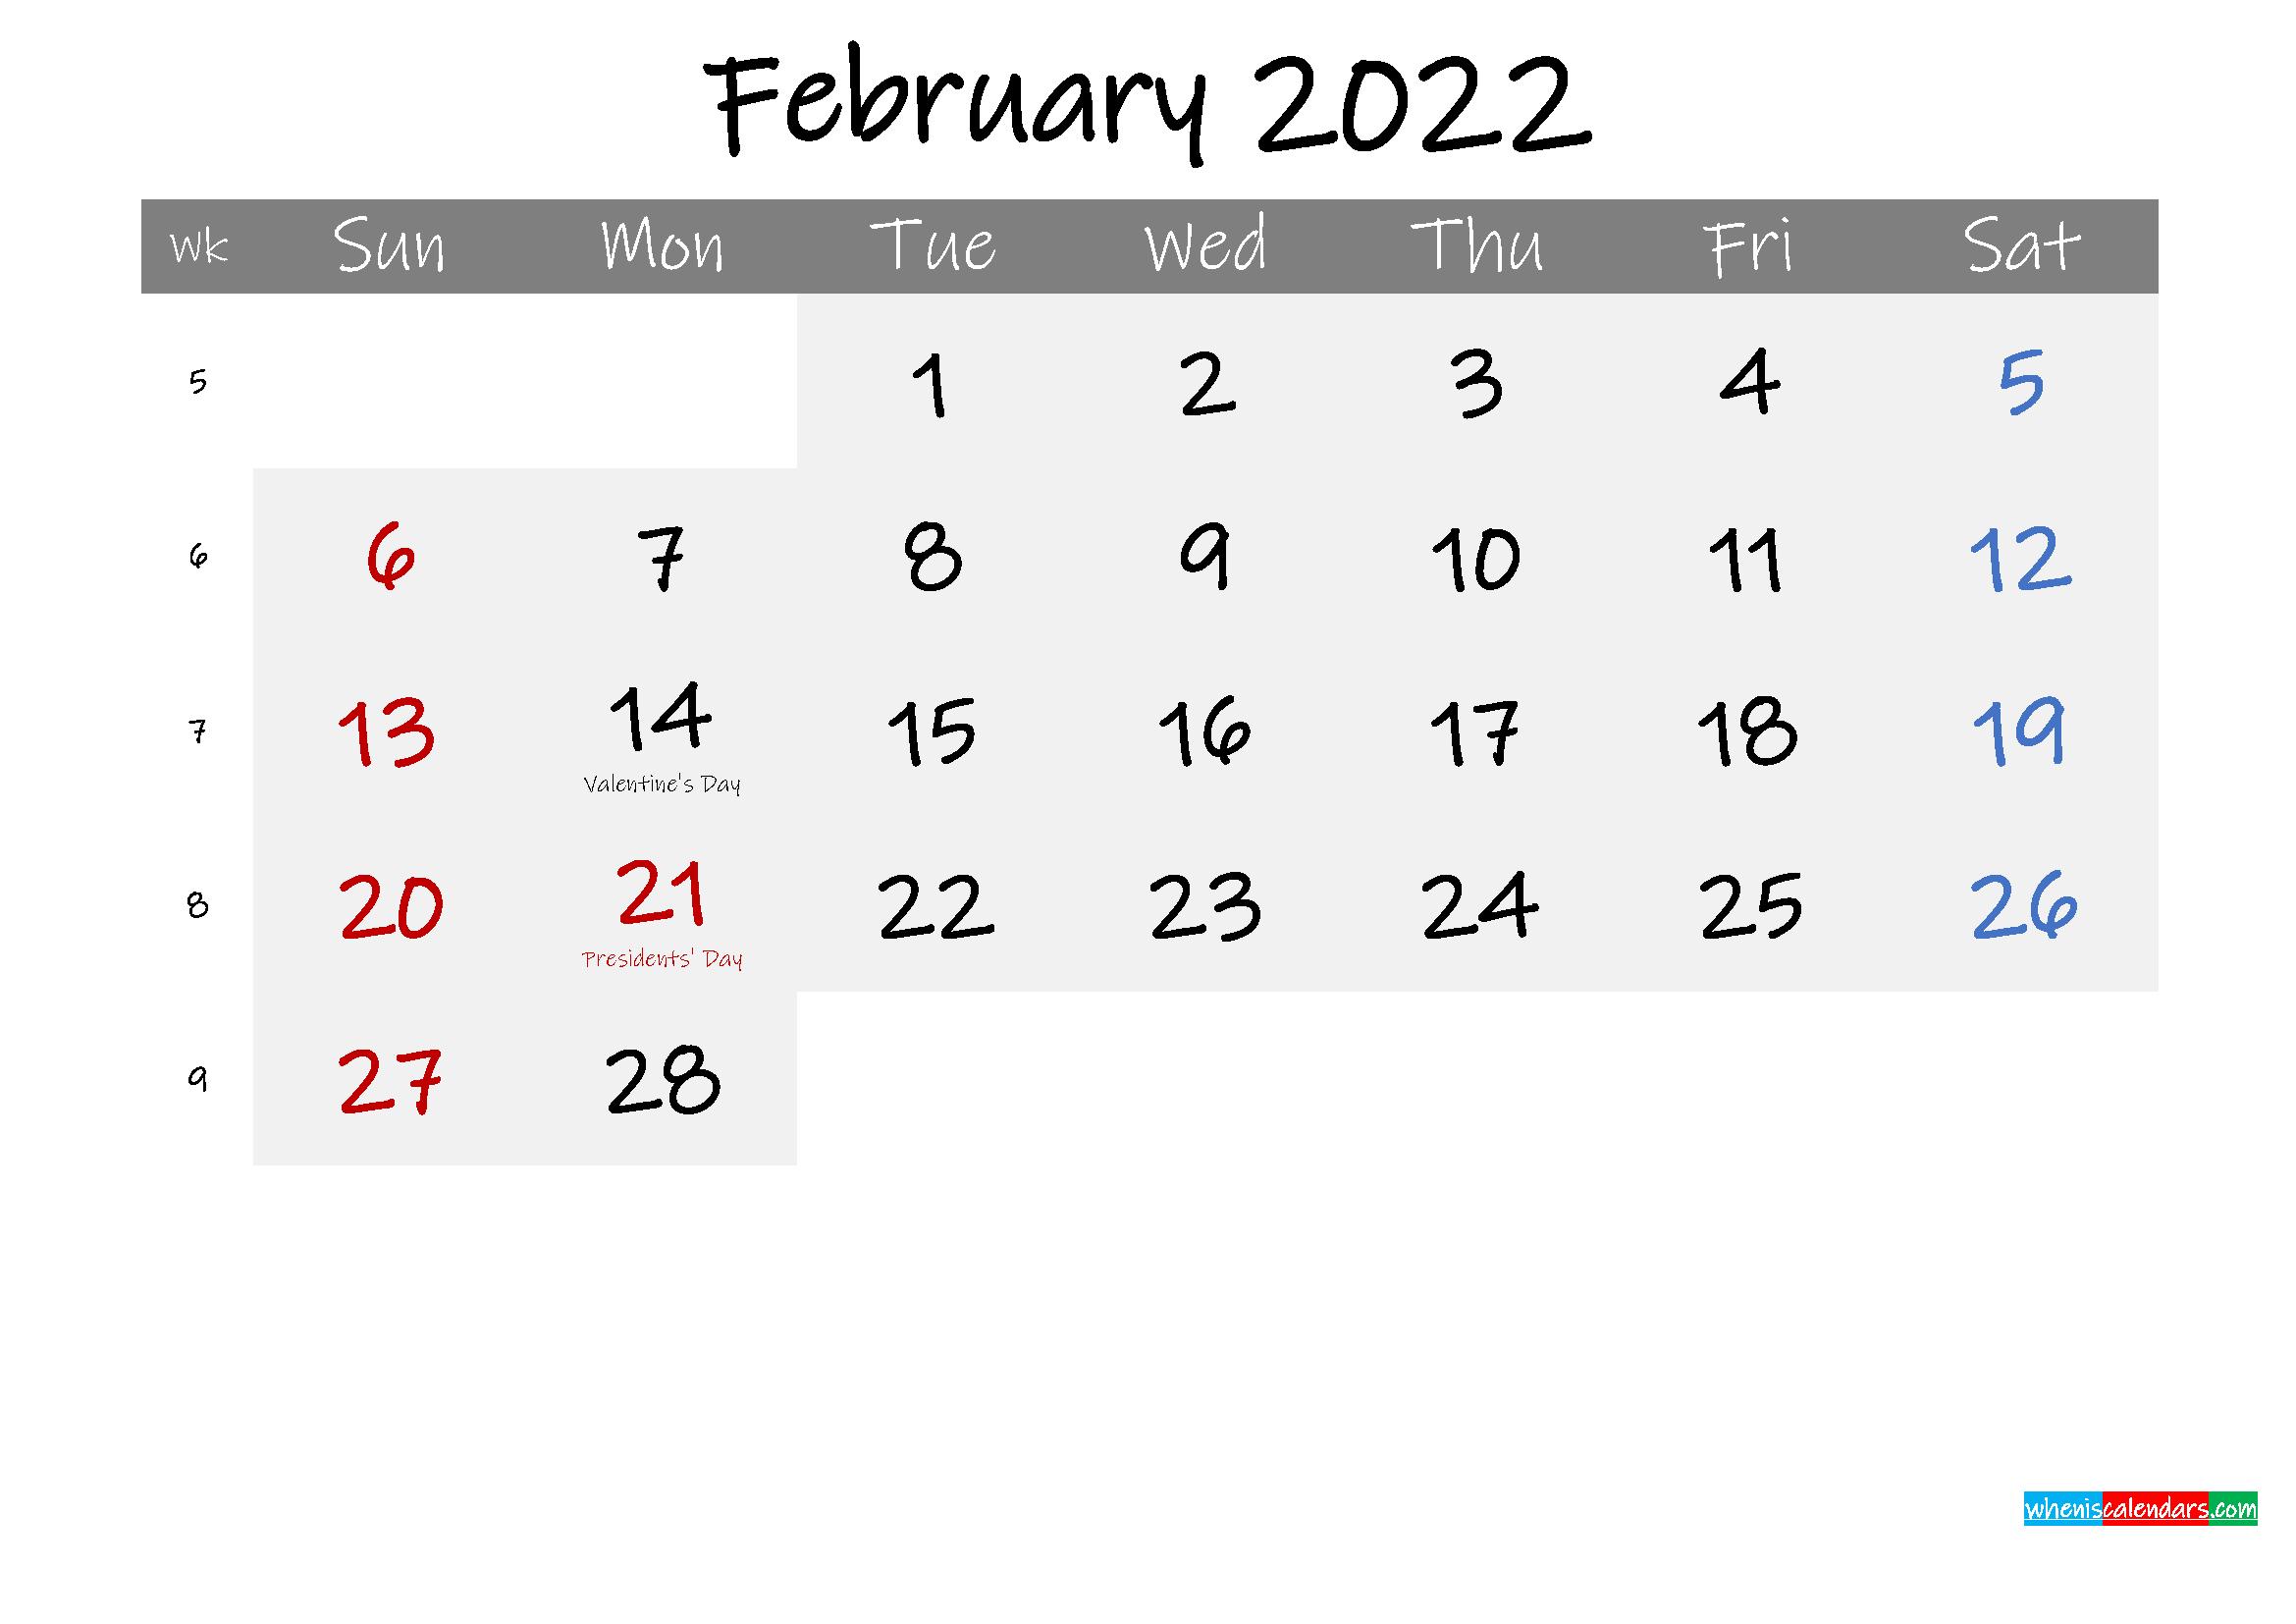 Free February 2022 Monthly Calendar Template Word regarding 2022 Weekly Planner Printable Image